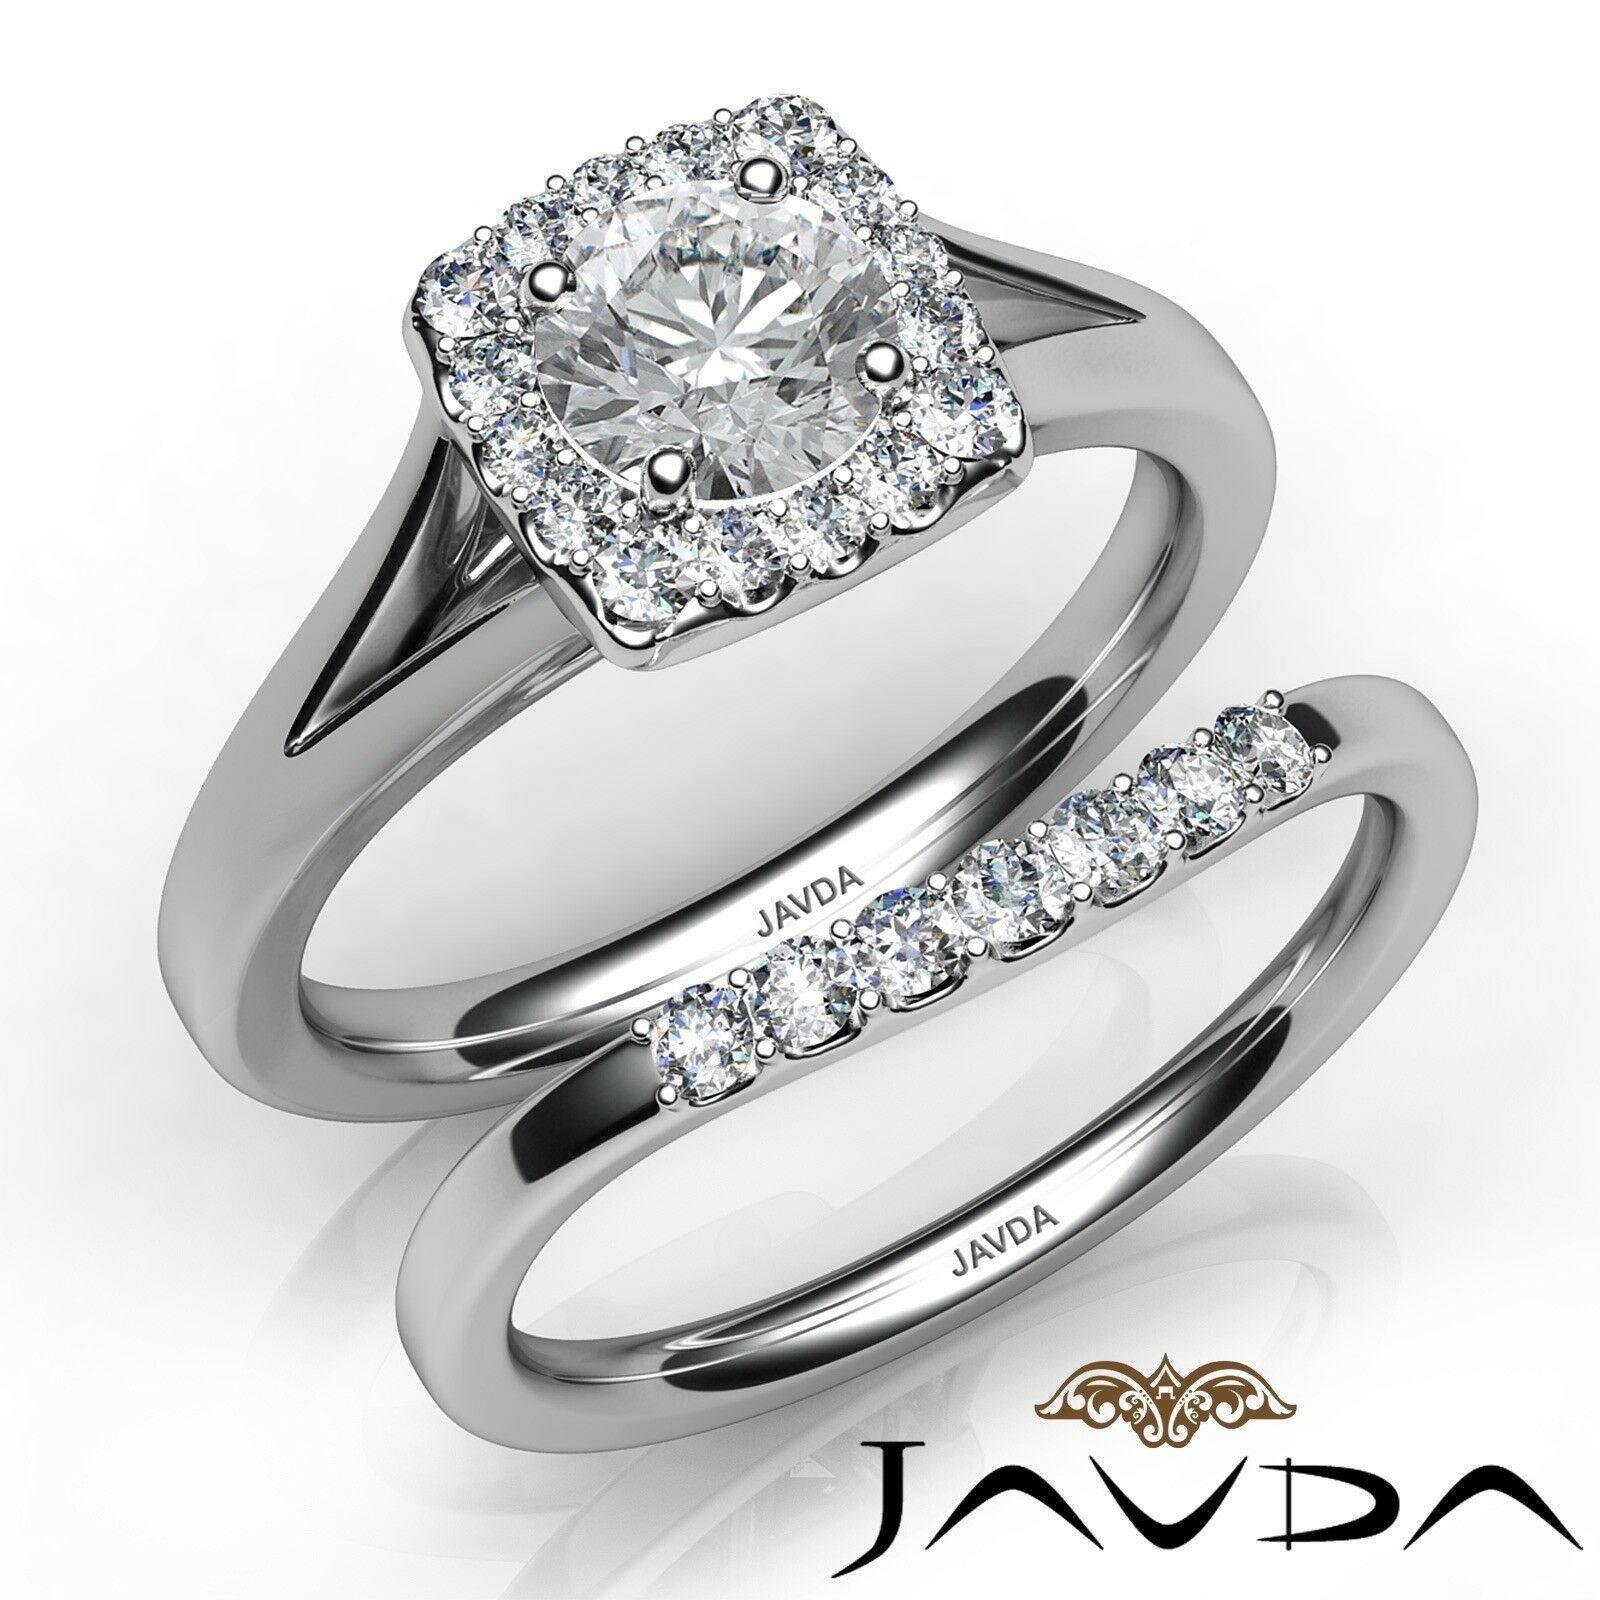 1.22ct Halo Side Stone Bridal Set Round Diamond Engagement Ring GIA F-VS1 W Gold